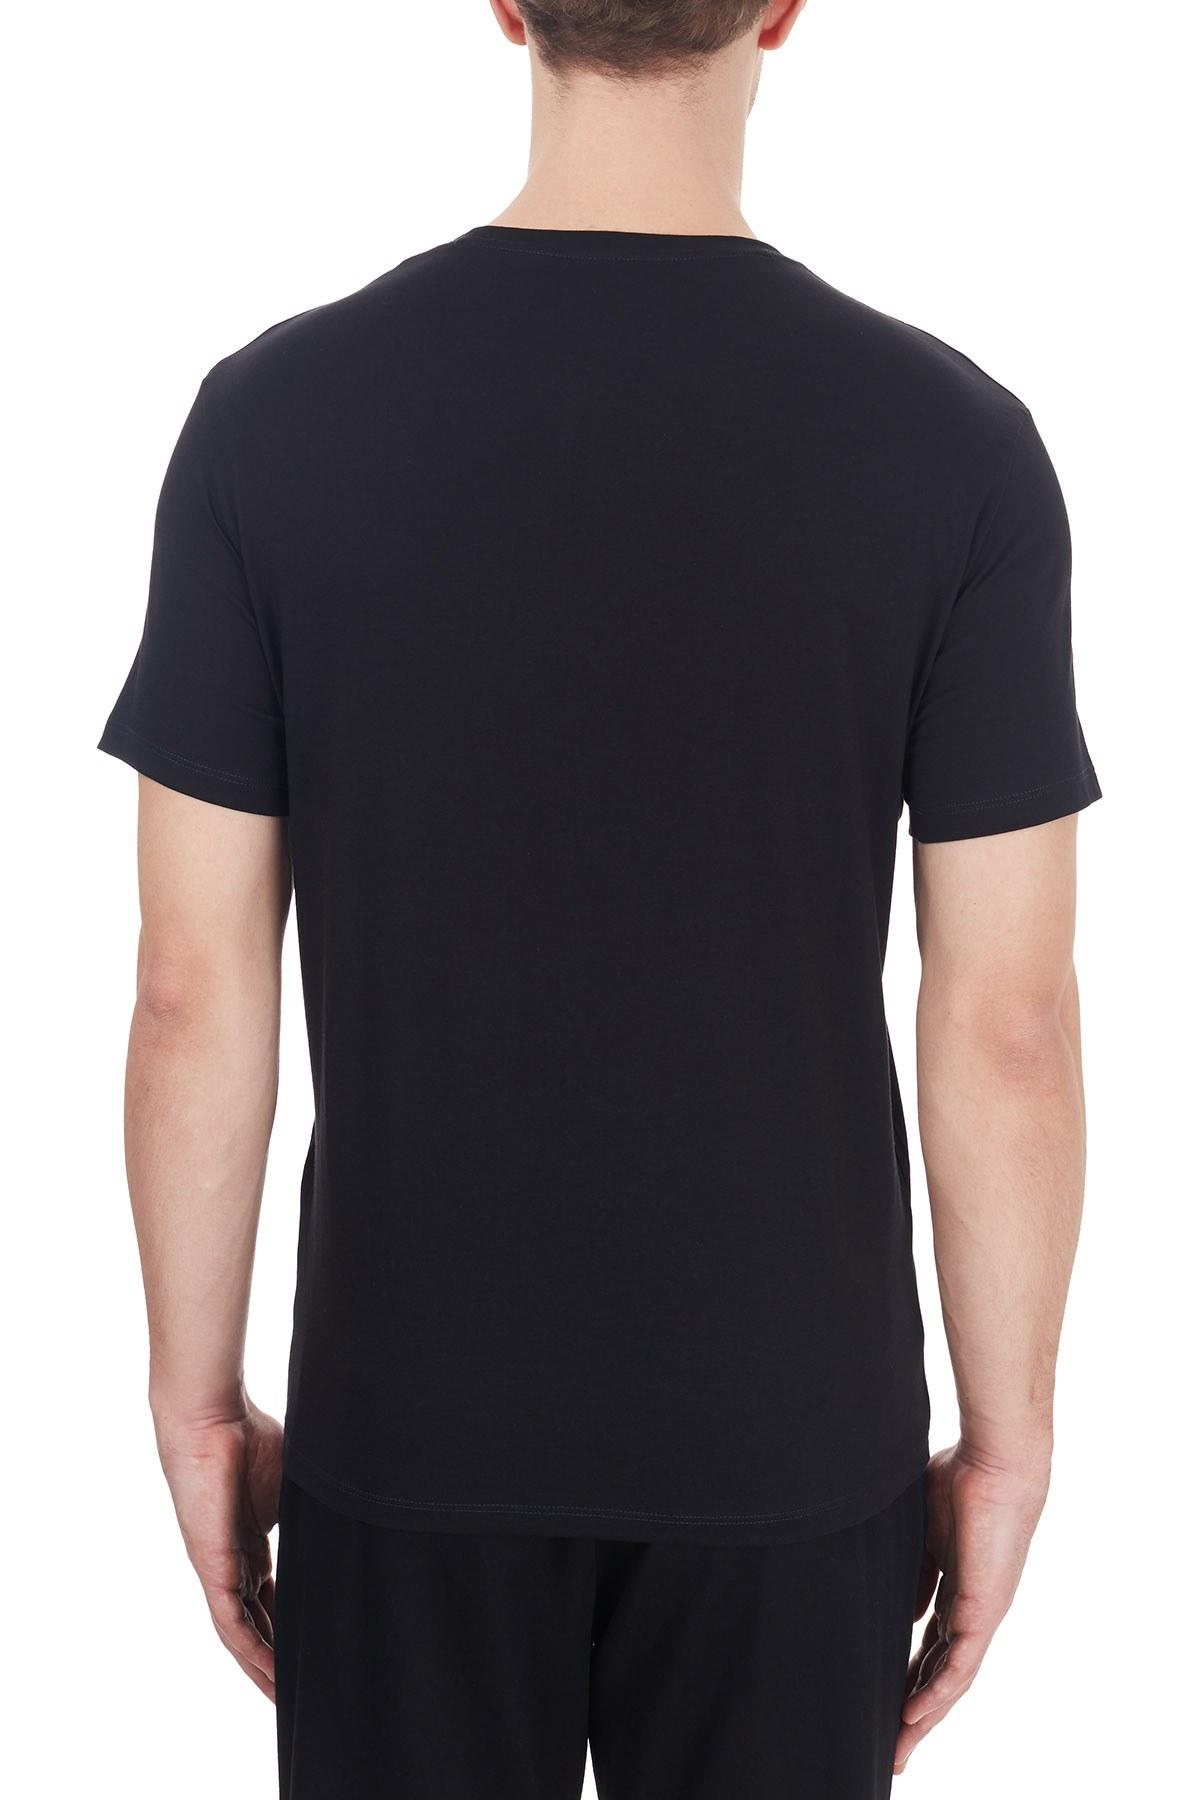 Armani Exchange % 100 Pamuklu Baskılı Bisiklet Yaka Erkek T Shirt 6HZTAH ZJA5Z 1200 SİYAH